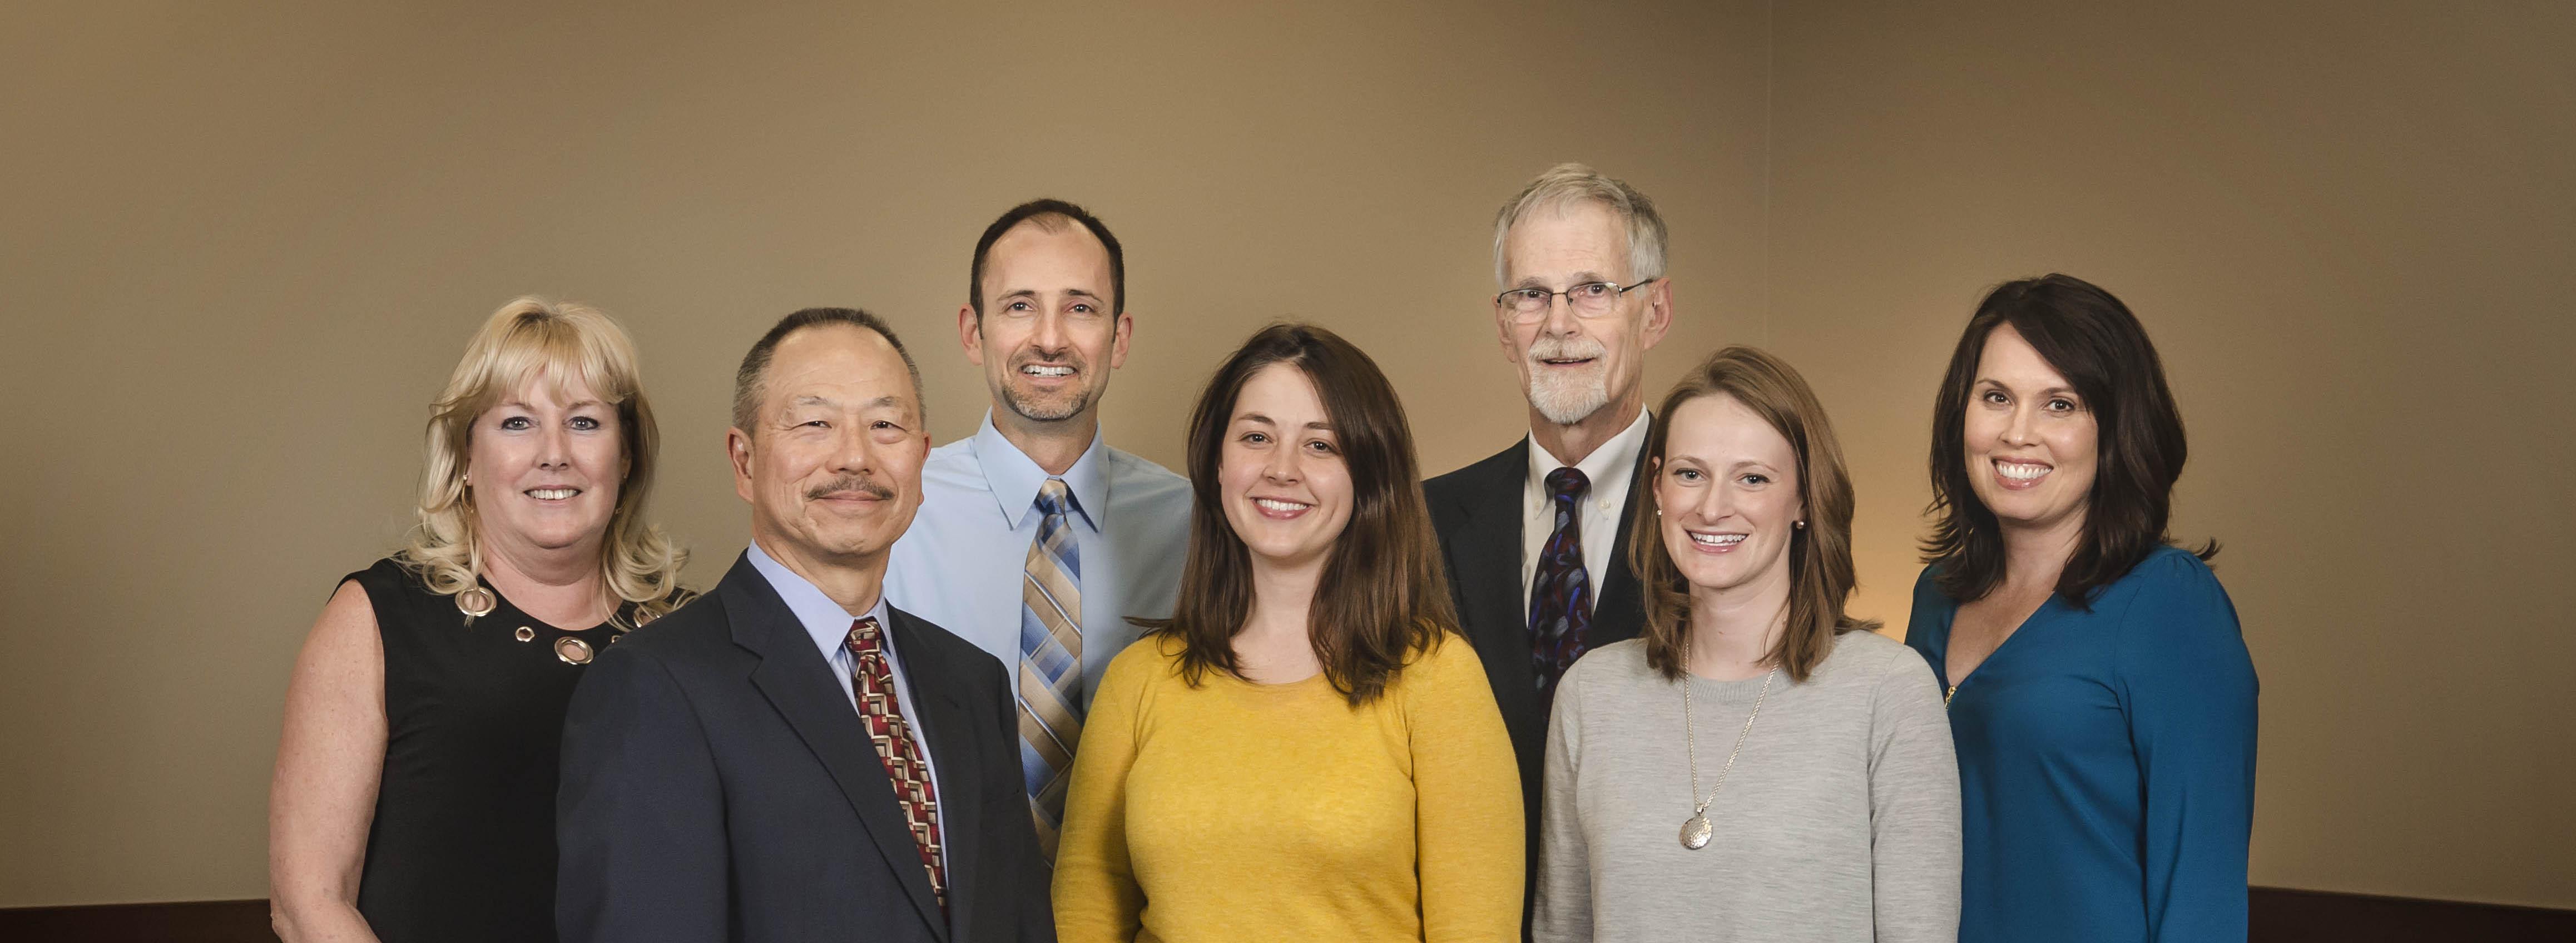 Columbus Internal Medicine Associates | Columbus Regional Health